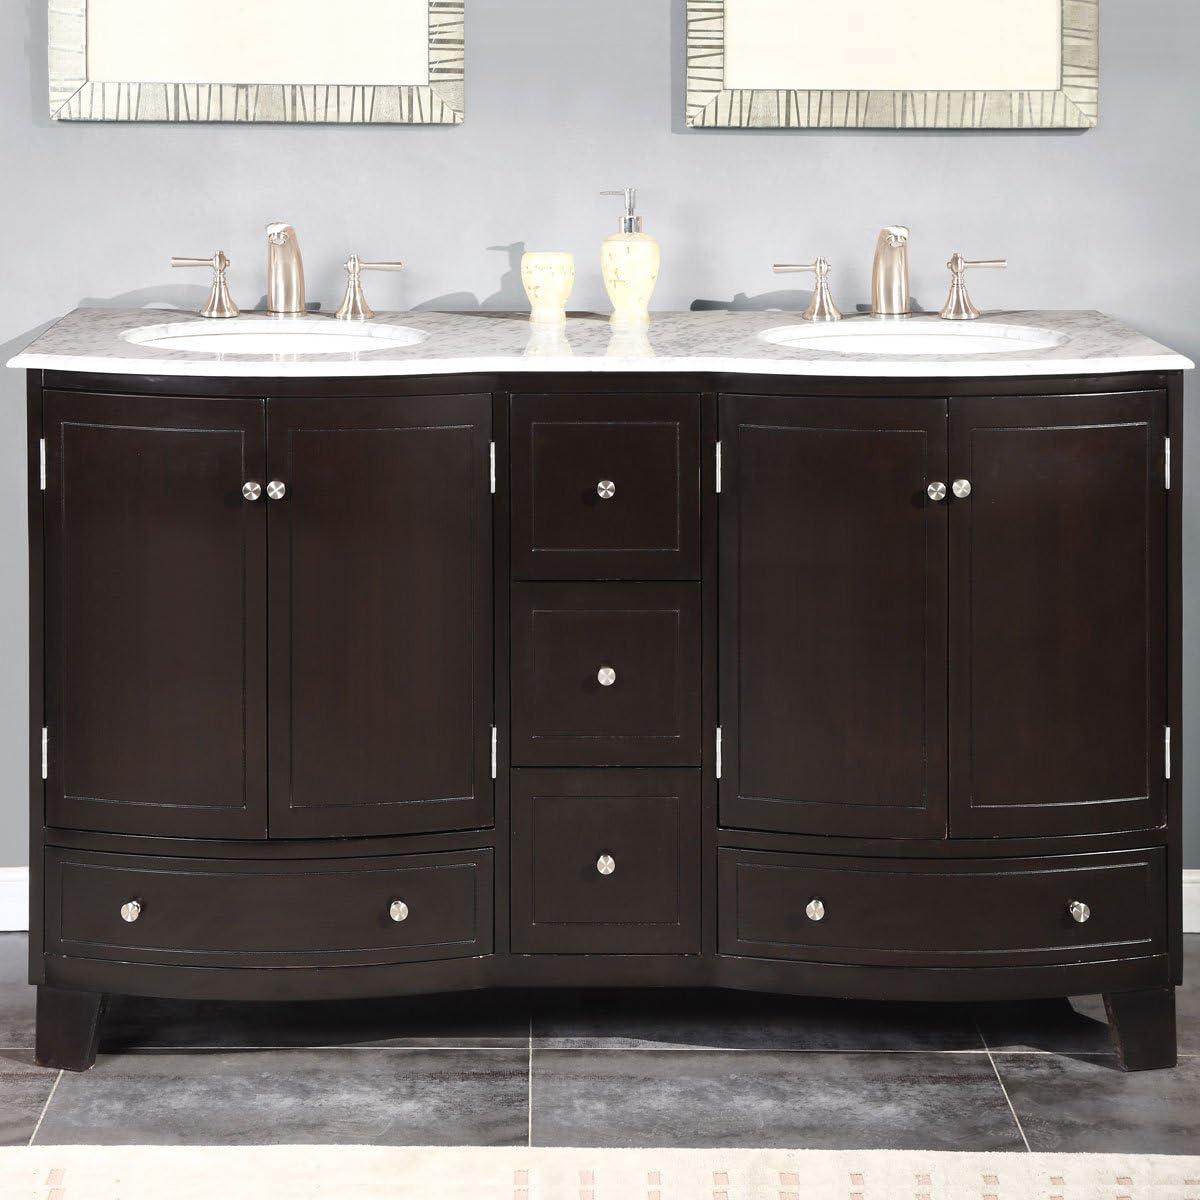 Amazon Com Silkroad Exclusive Hyp 0703 Wm Uwc 60 Carrara White Marble Top Double Sink Bathroom Vanity With Espresso Cabinet 60 Dark Wood Tools Home Improvement